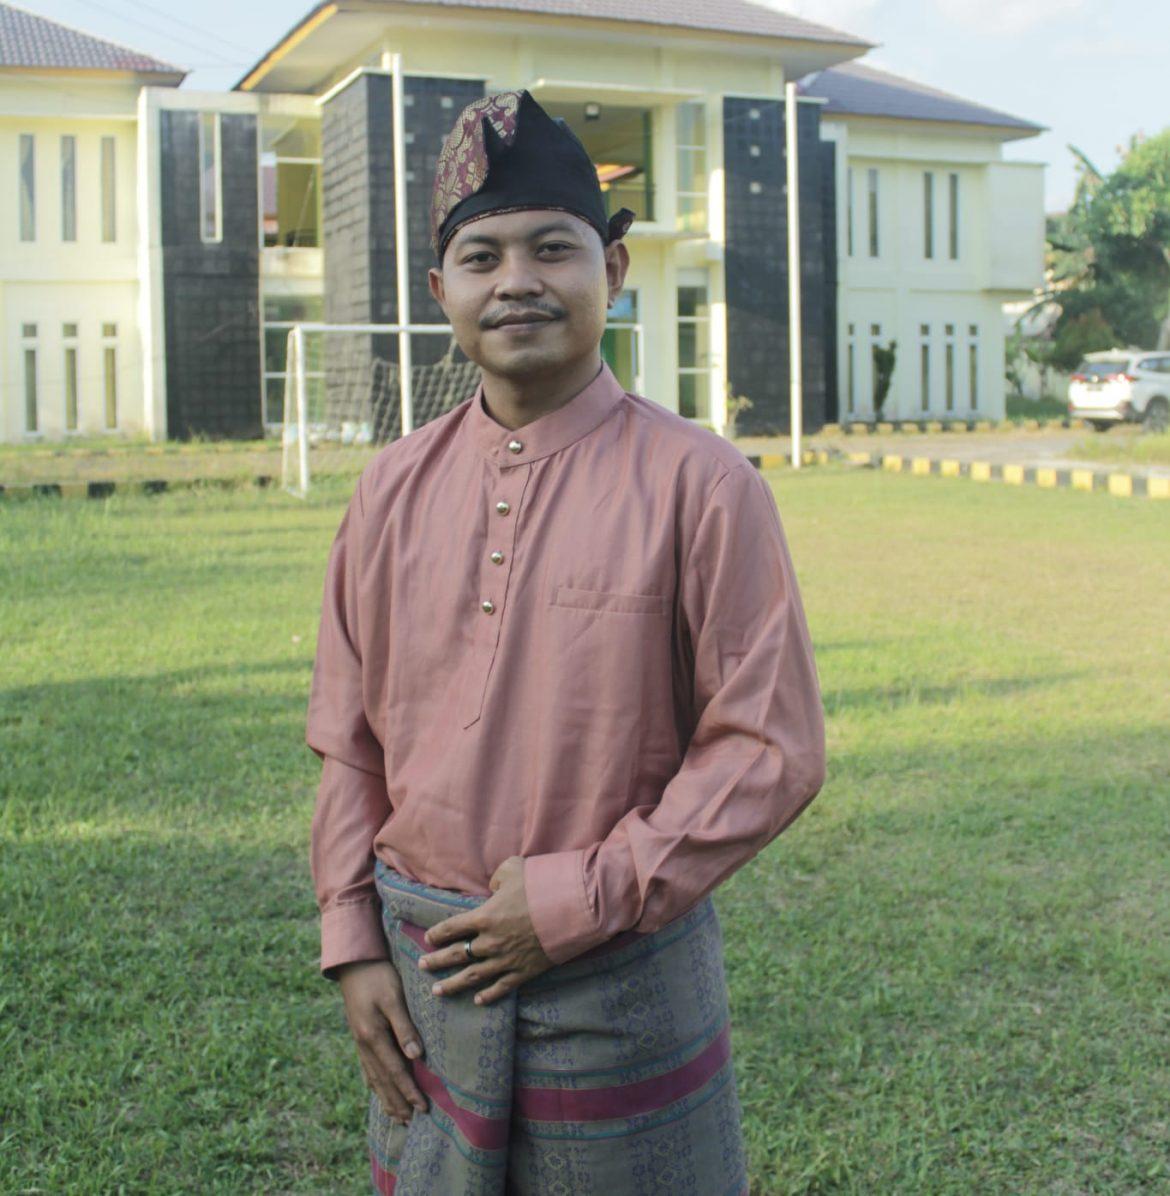 Refleksi 19 Tahun Kepri, IMPKR -Pekanbaru : Harapan Kami Gubernur-Wagub Terus Akur